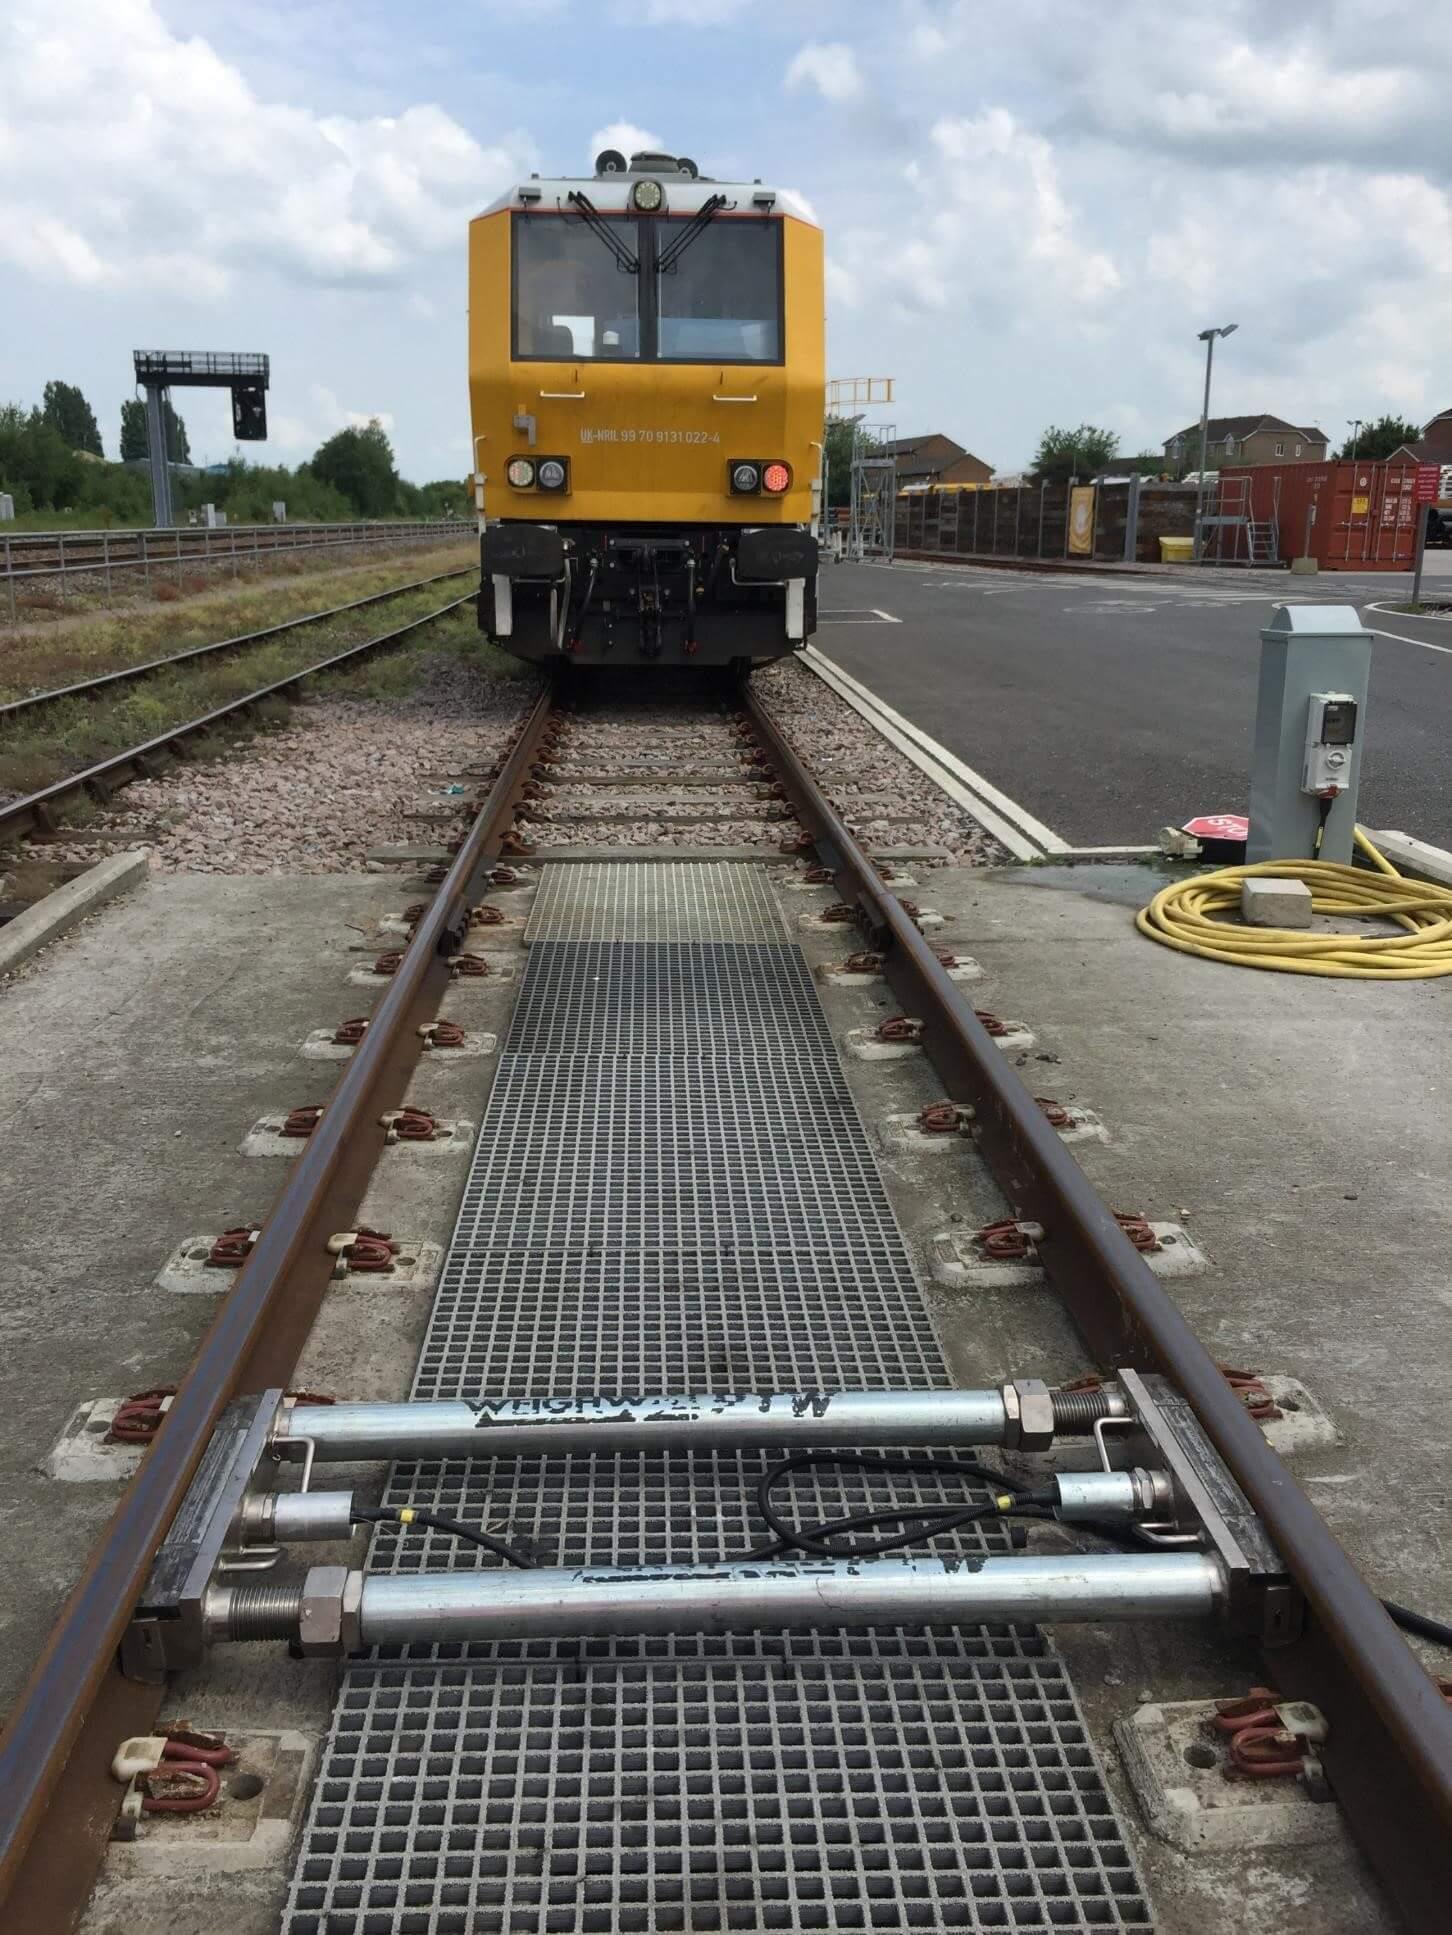 Train weighing at Swindon